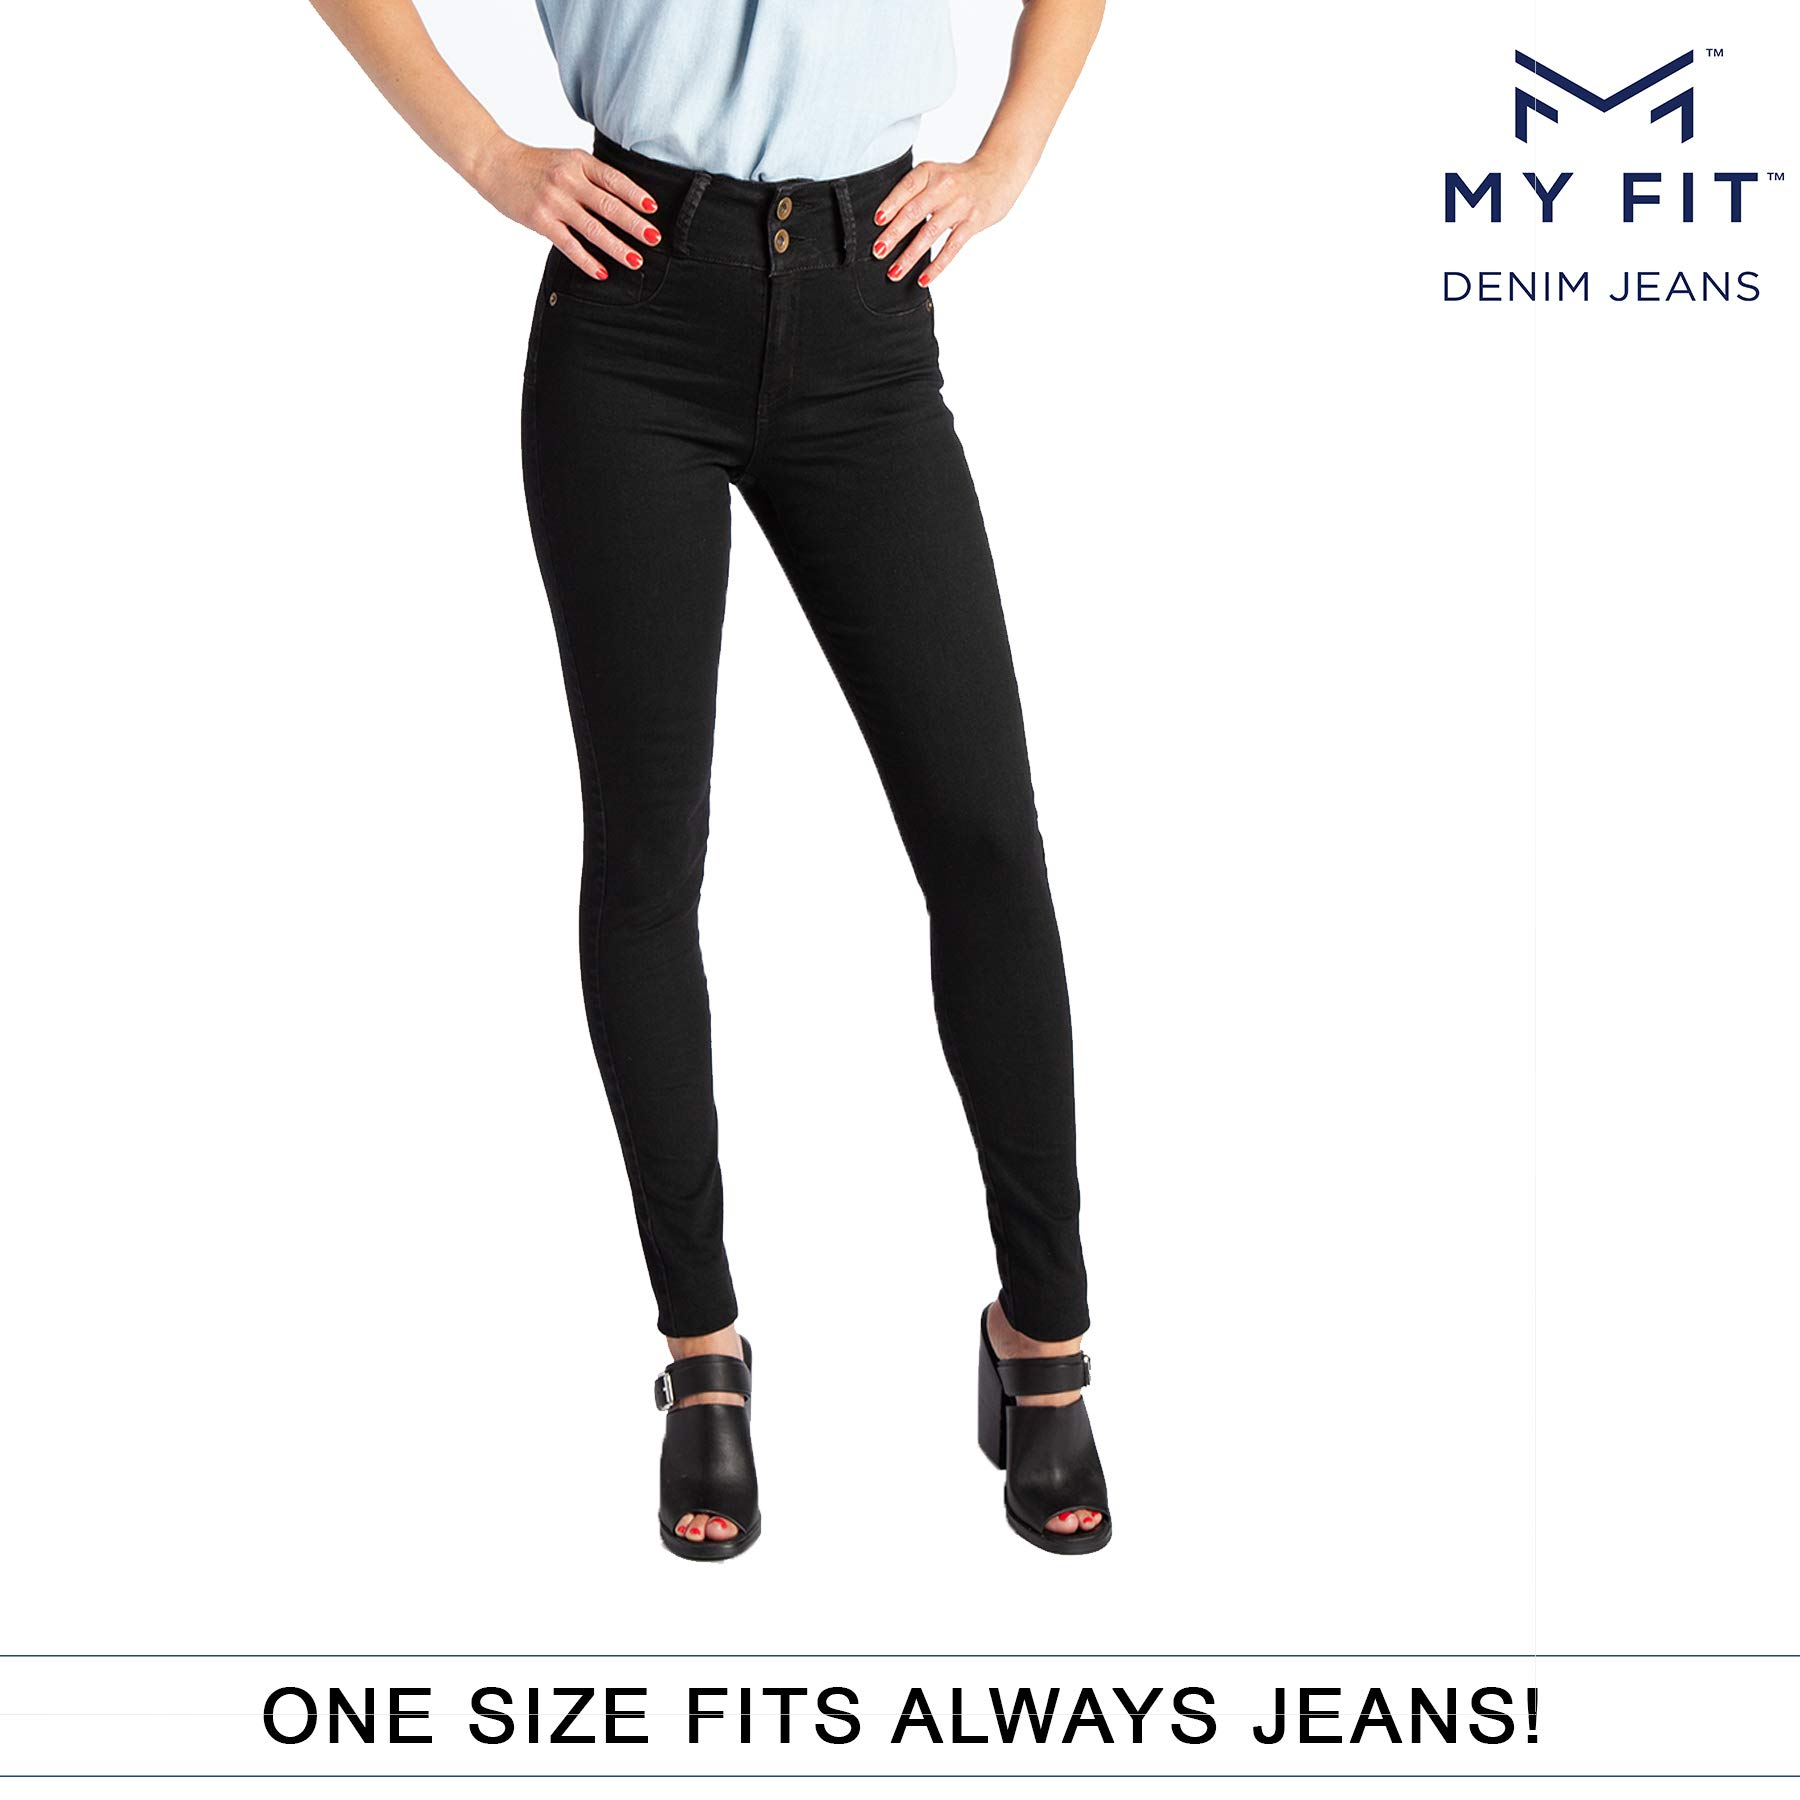 649ff5b02d0 My Fit Jeans- SIZE 2-12 BLACK  Women s Stretch Denim Jeans with Pockets